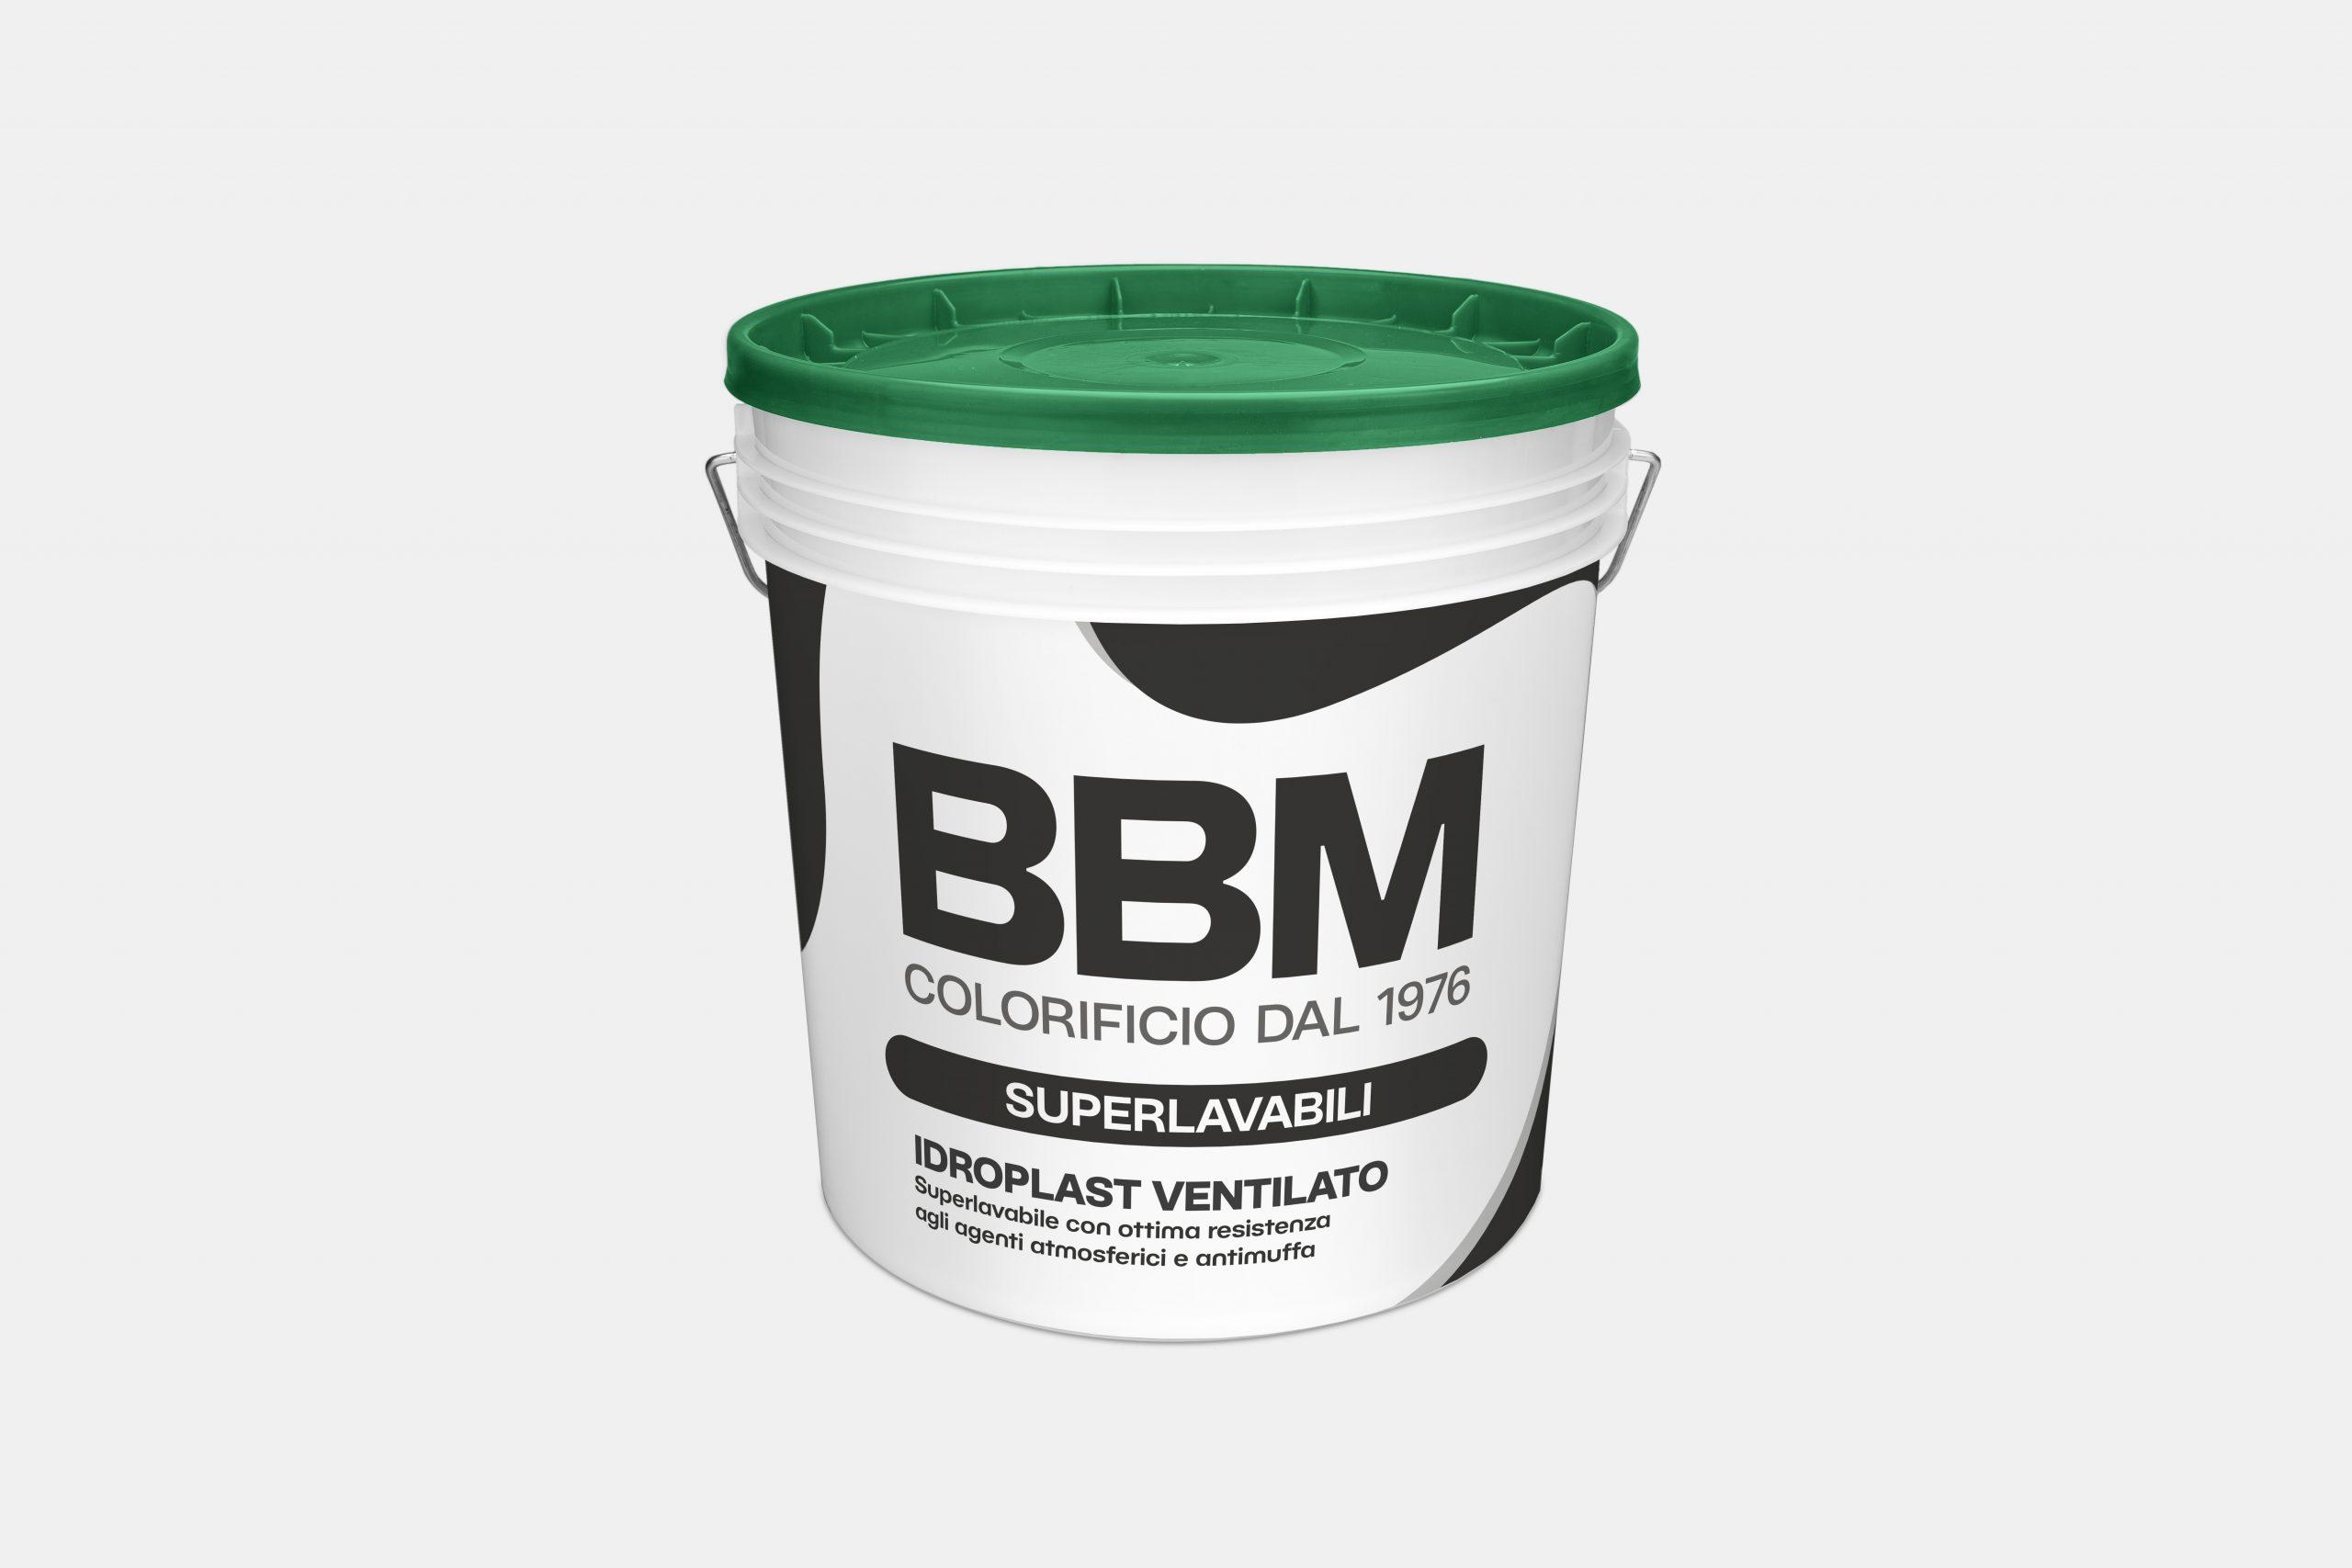 https://bbm-colorificio.it/wp-content/uploads/2021/07/Idroplast-ventilato-scaled.jpg